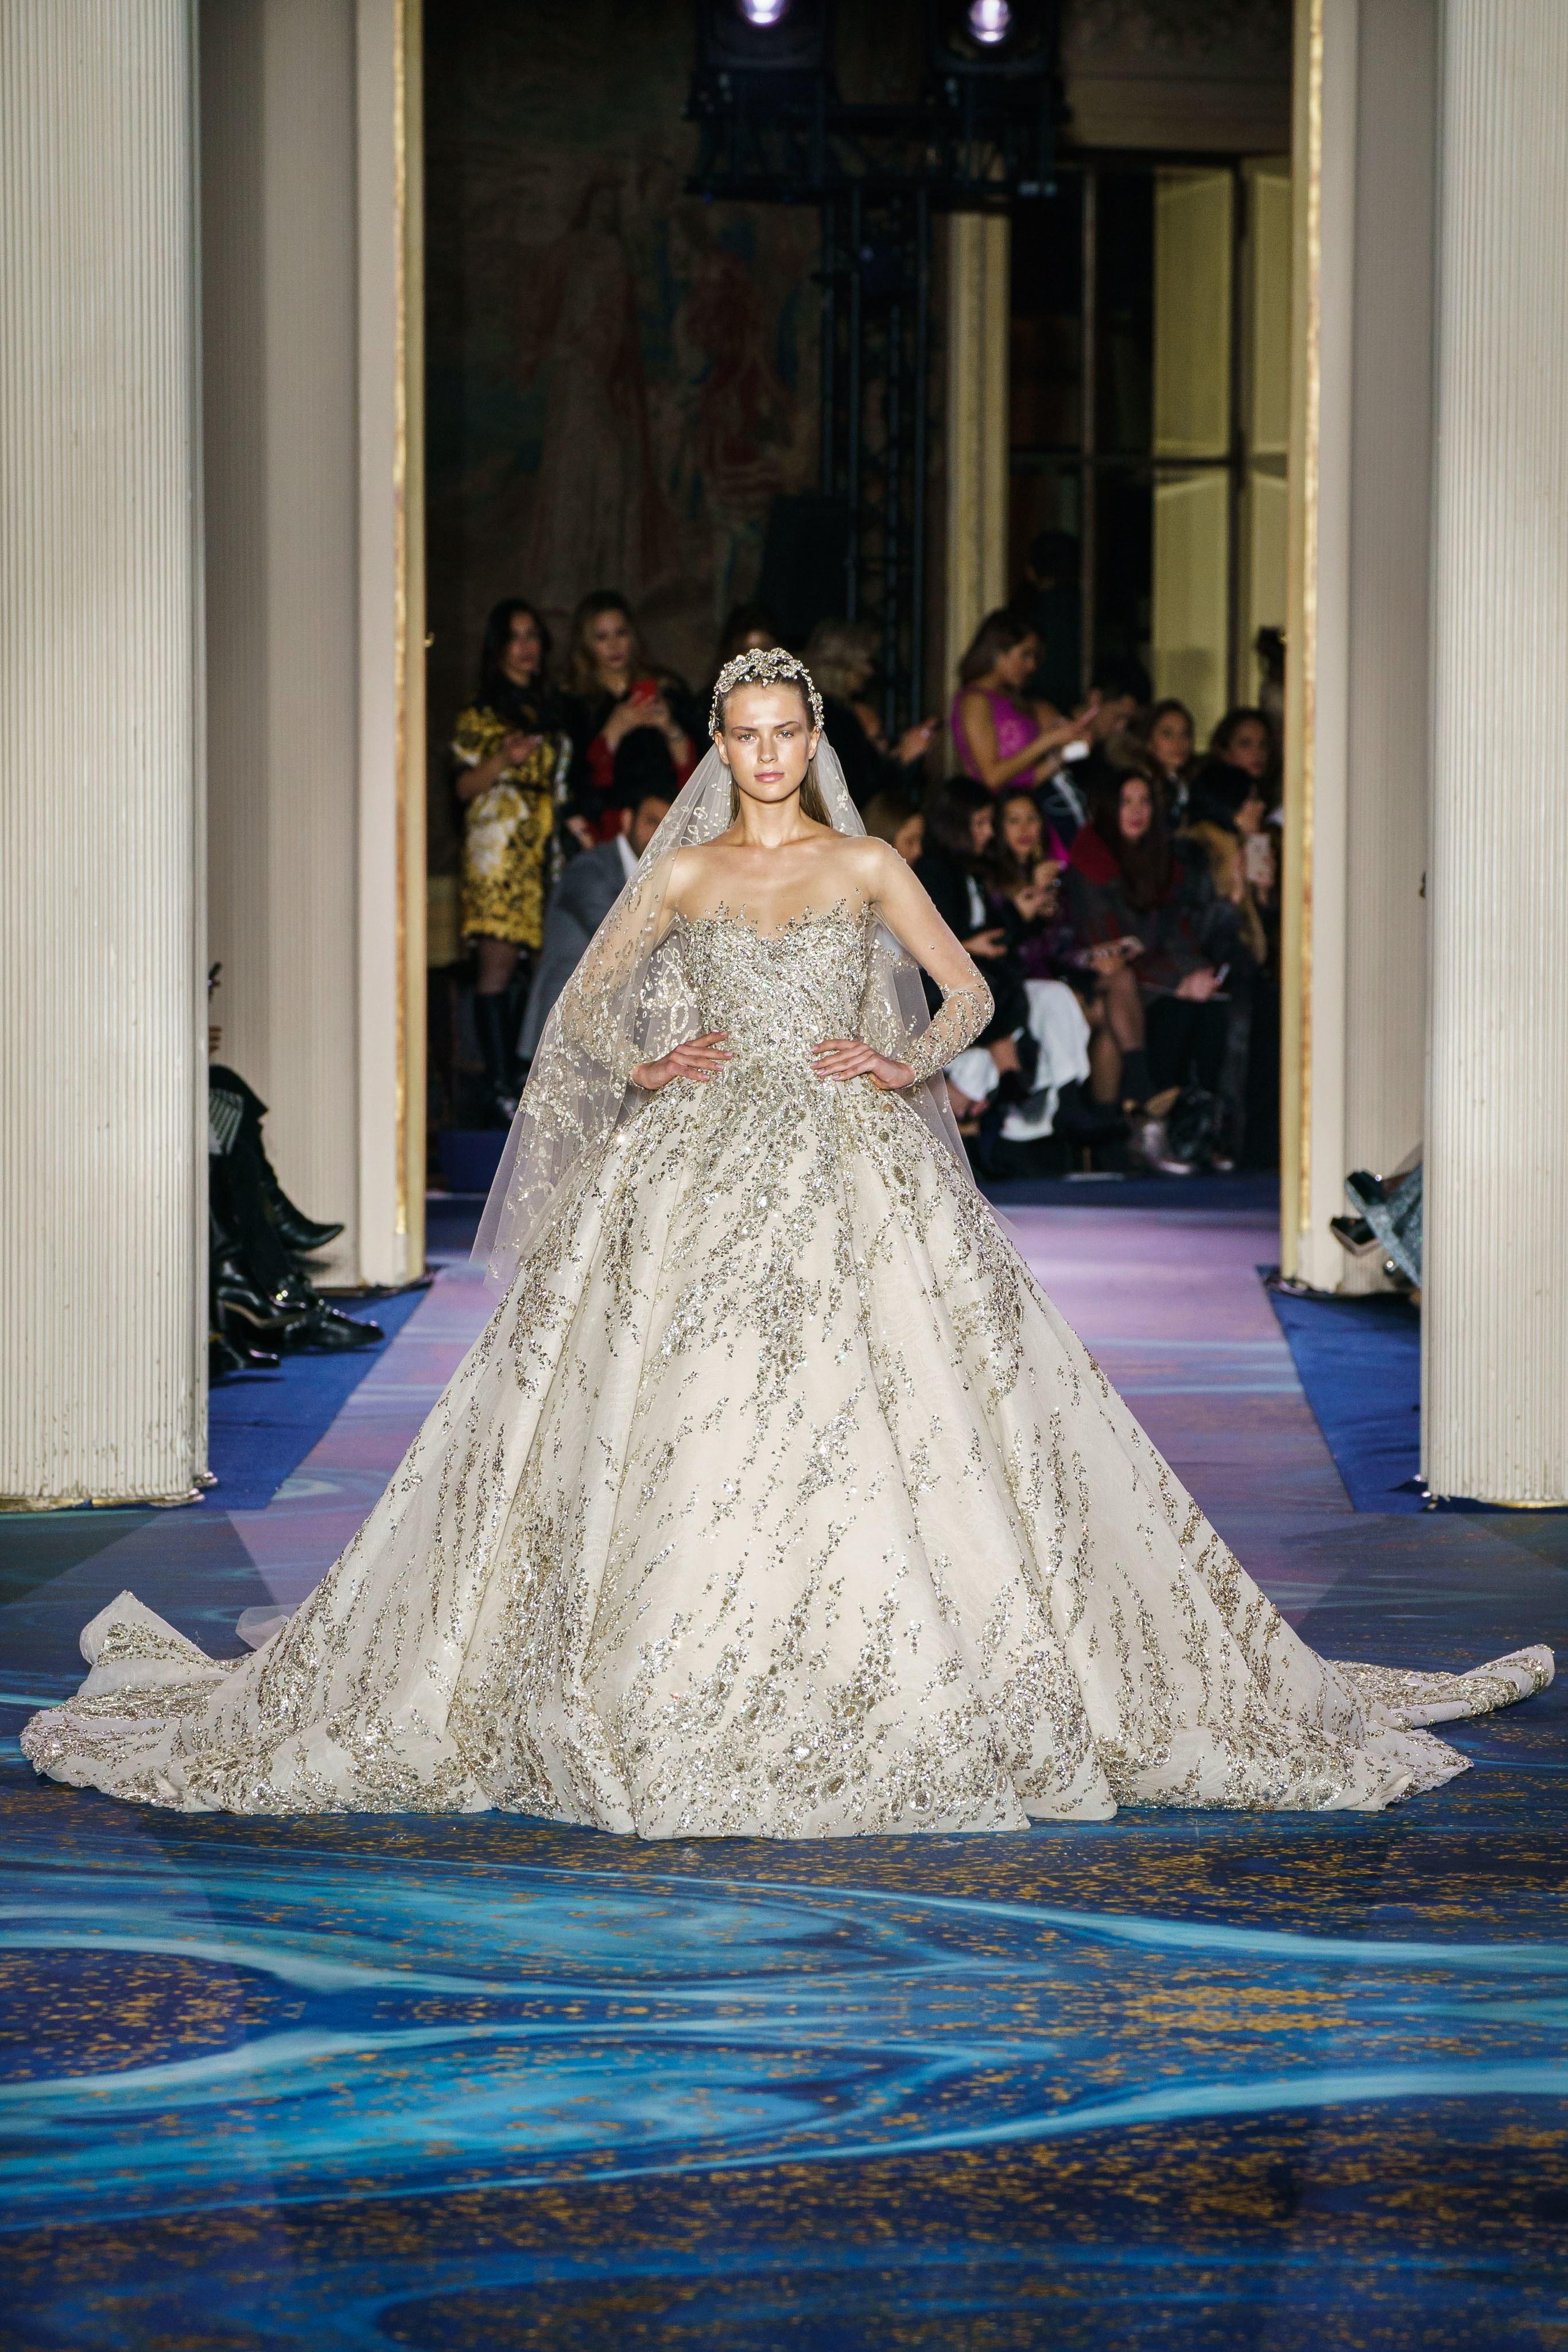 db1c767767b03 فساتين الزفاف اللبنانية لربيع 2019 من أسبوع الموضة الباريسي ...